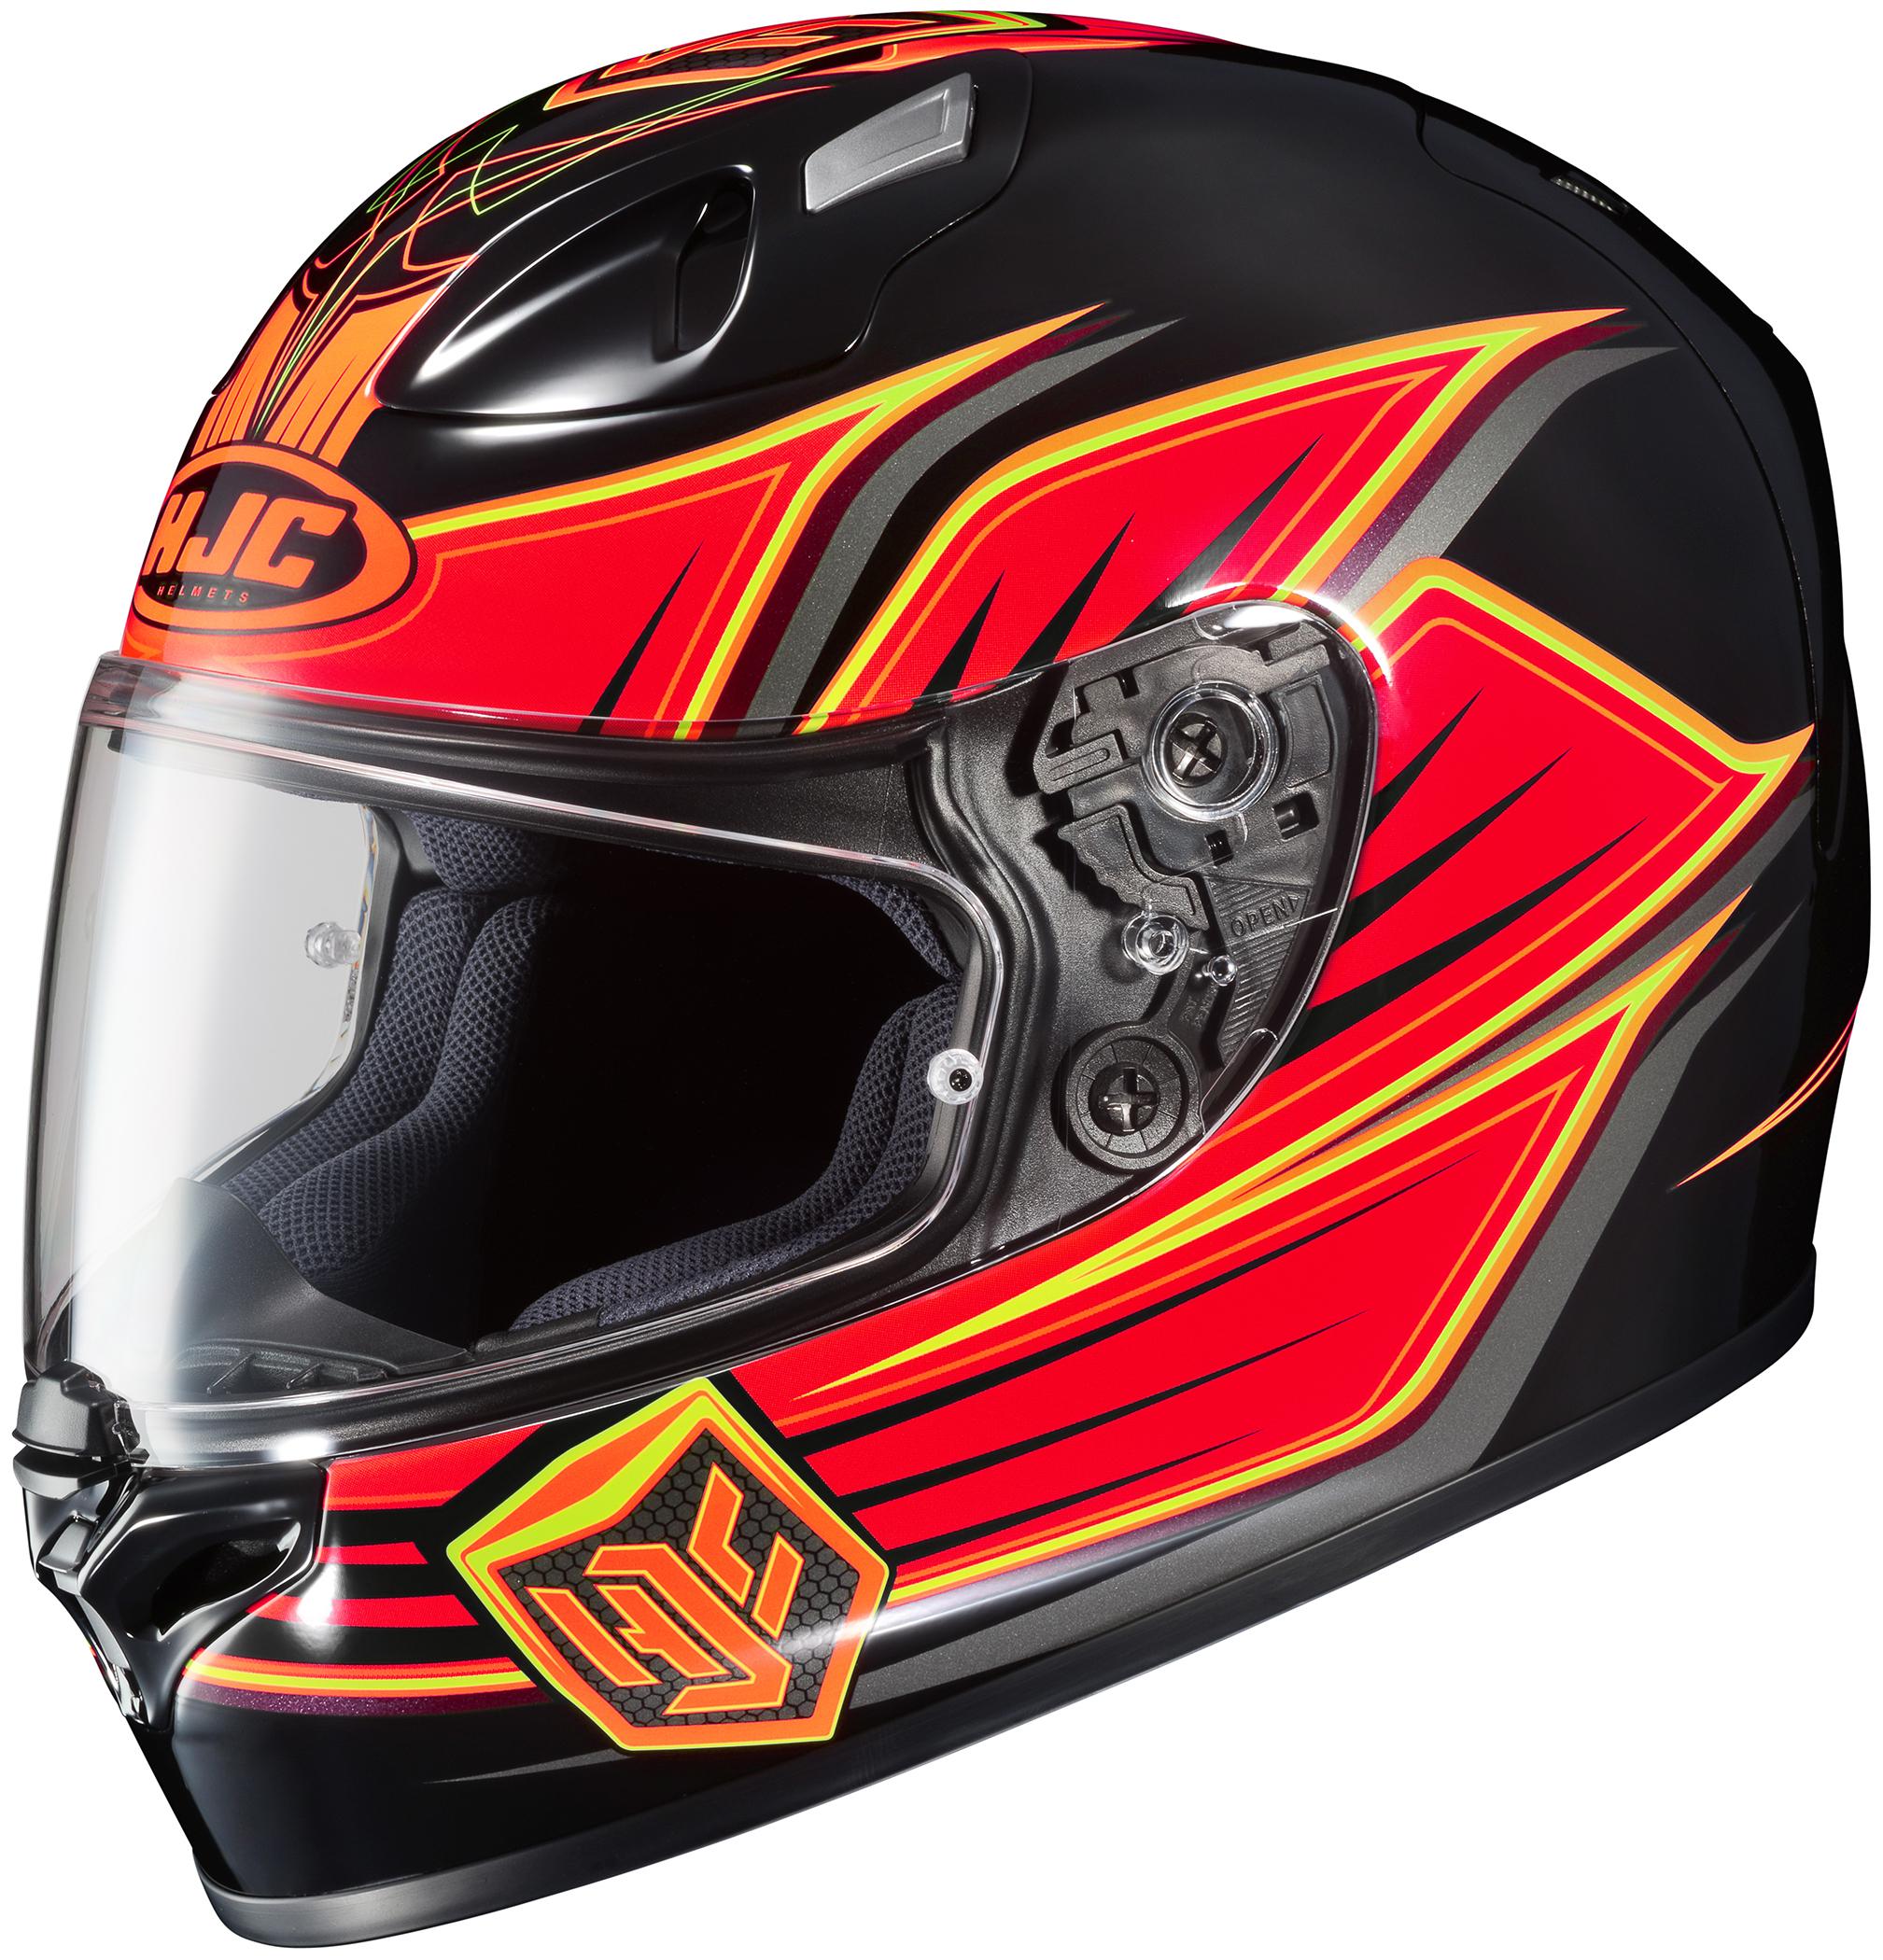 hjc fg 17 banshee motorcycle helmets closeout ebay. Black Bedroom Furniture Sets. Home Design Ideas